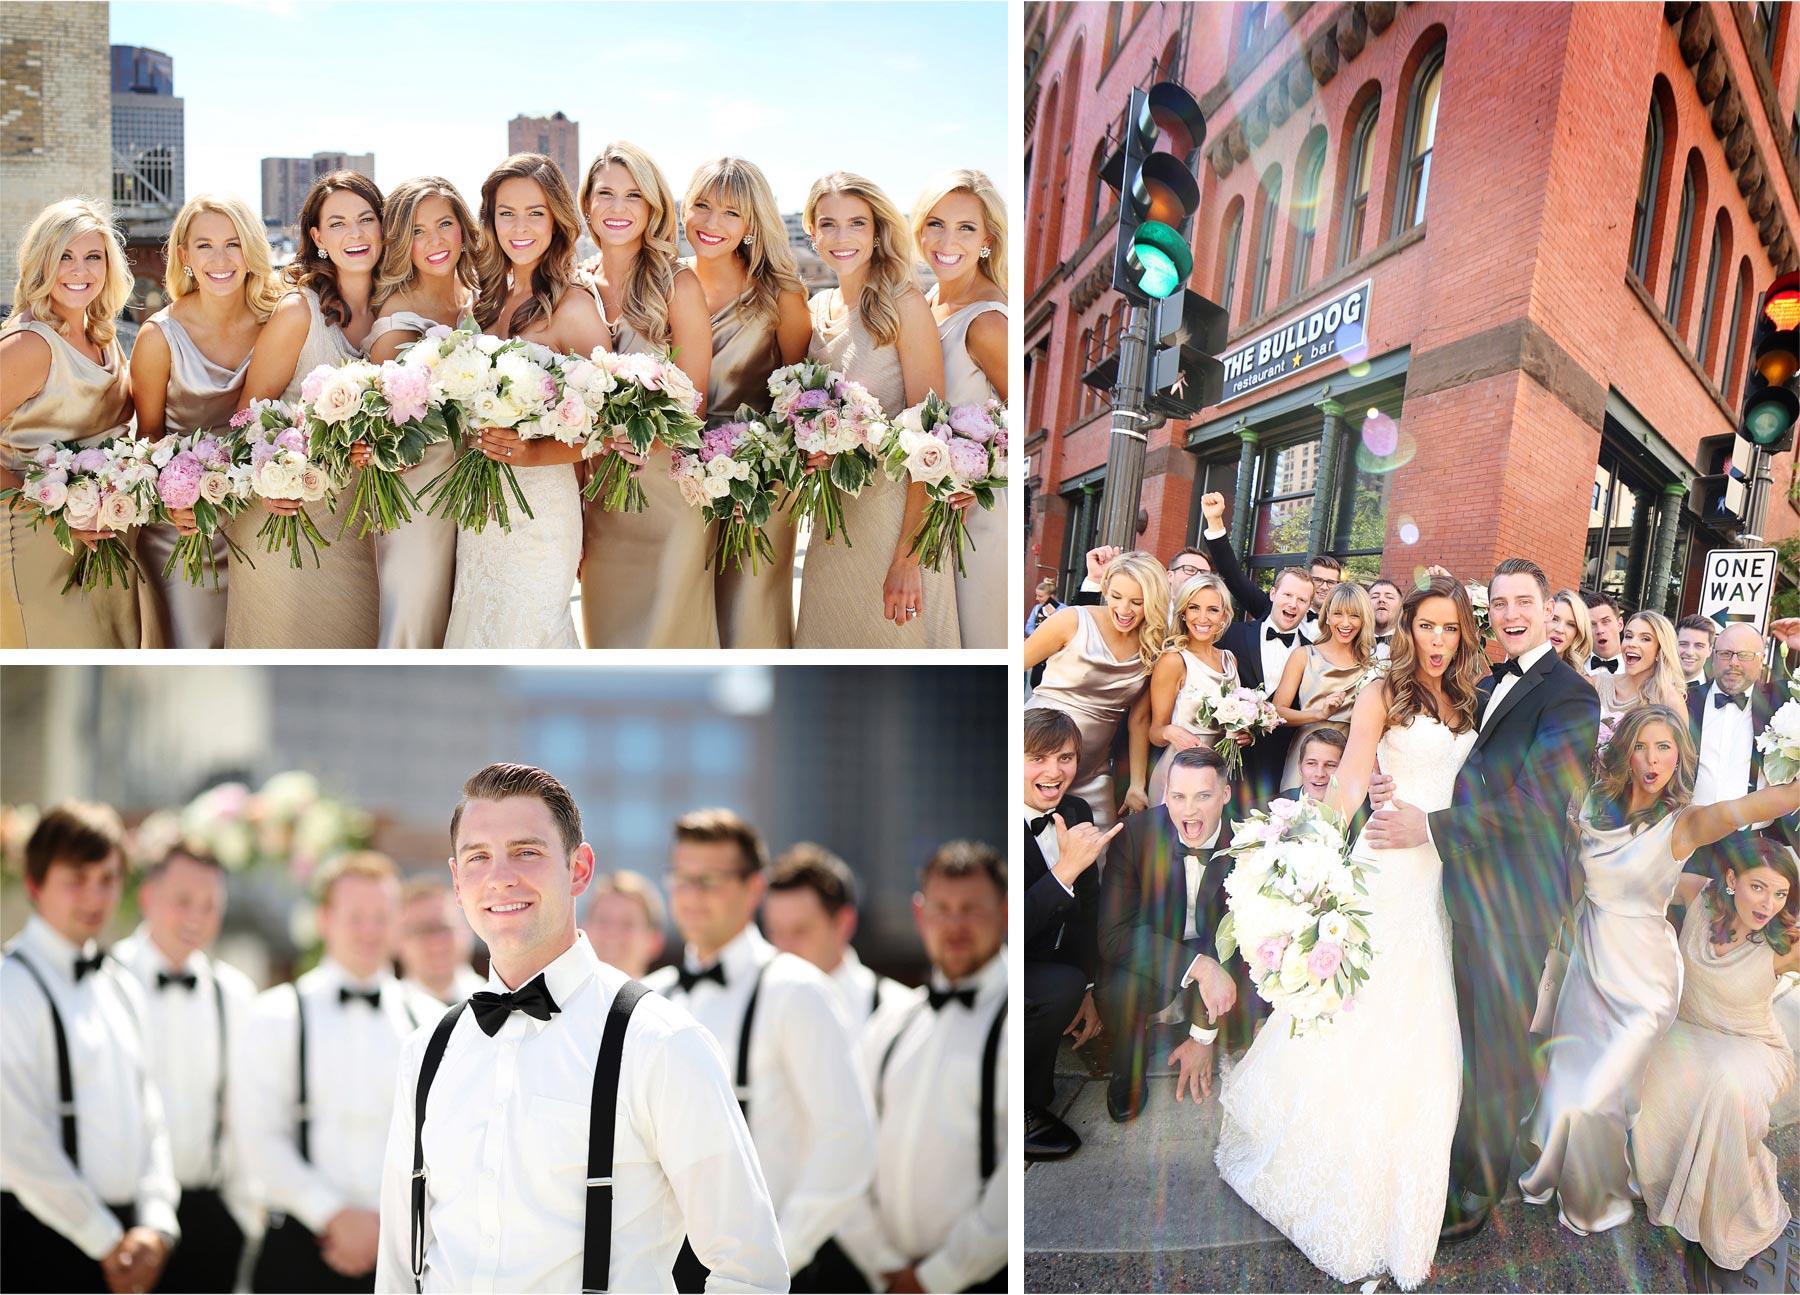 13-Saint-Paul-Minnesota-Wedding-Photographer-by-Andrew-Vick-Photography-Summer-Bride-Groom-Groomsmen-Bridesmaids-Bridal-Party-Flowers-Molly-and-Dan.jpg